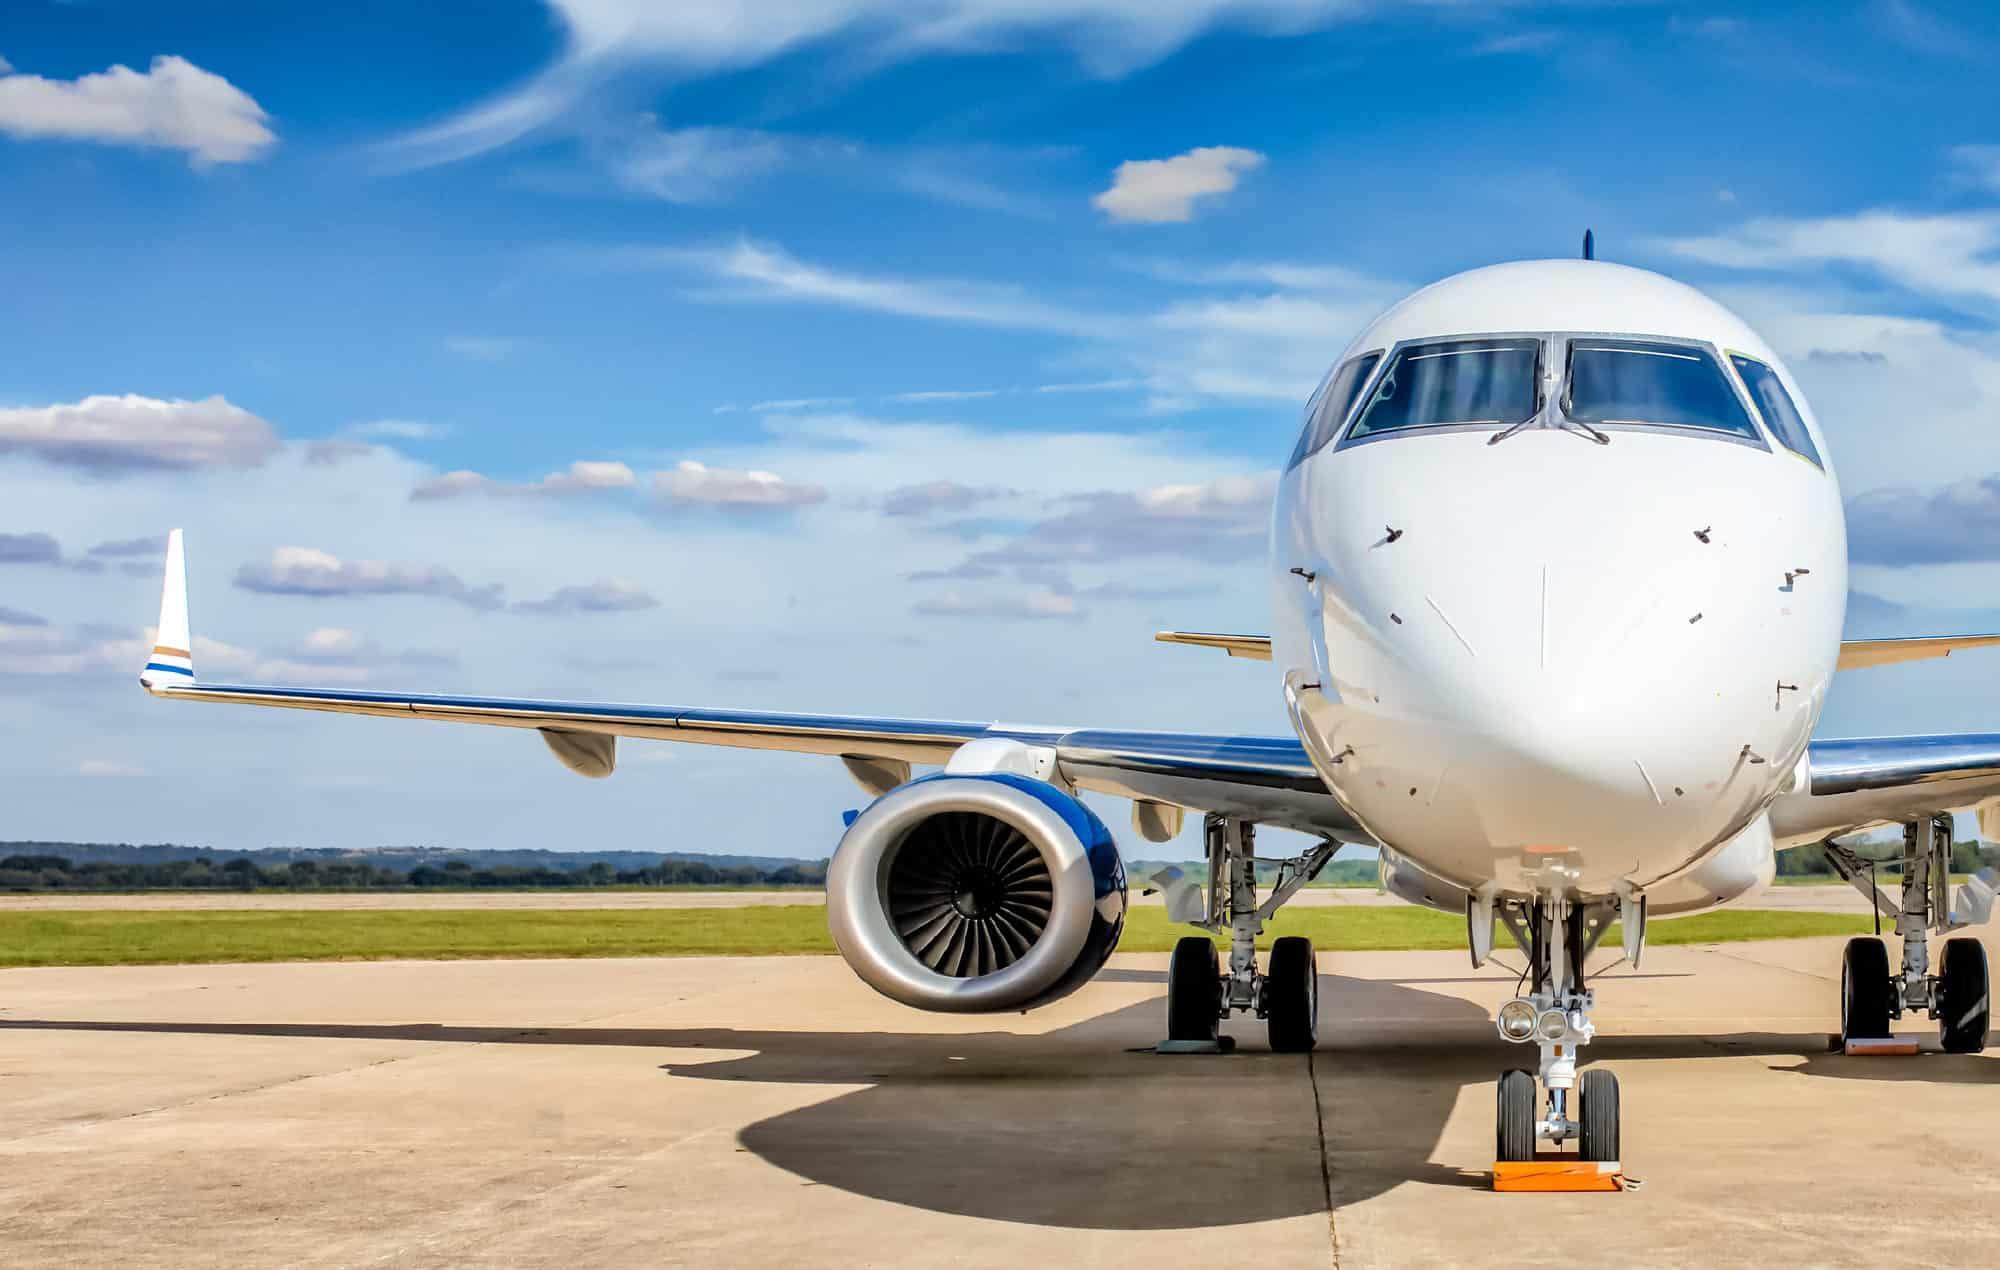 aircraft-maintenance-services-airx-jet-support